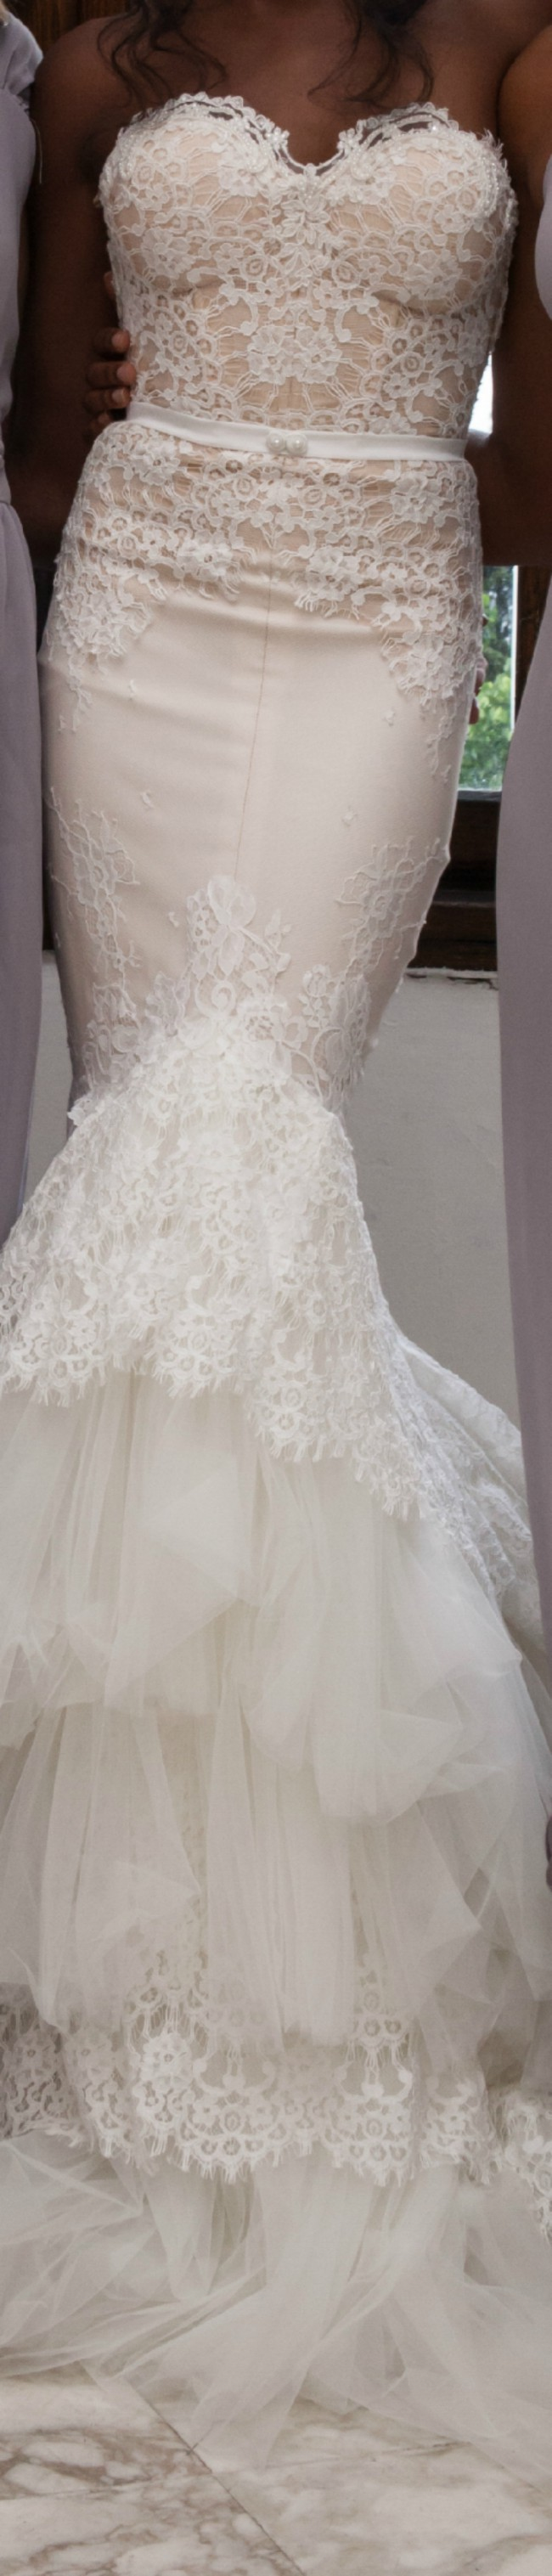 Inbal dror br 12 05 used wedding dress on sale 53 off for Inbal dror used wedding dress